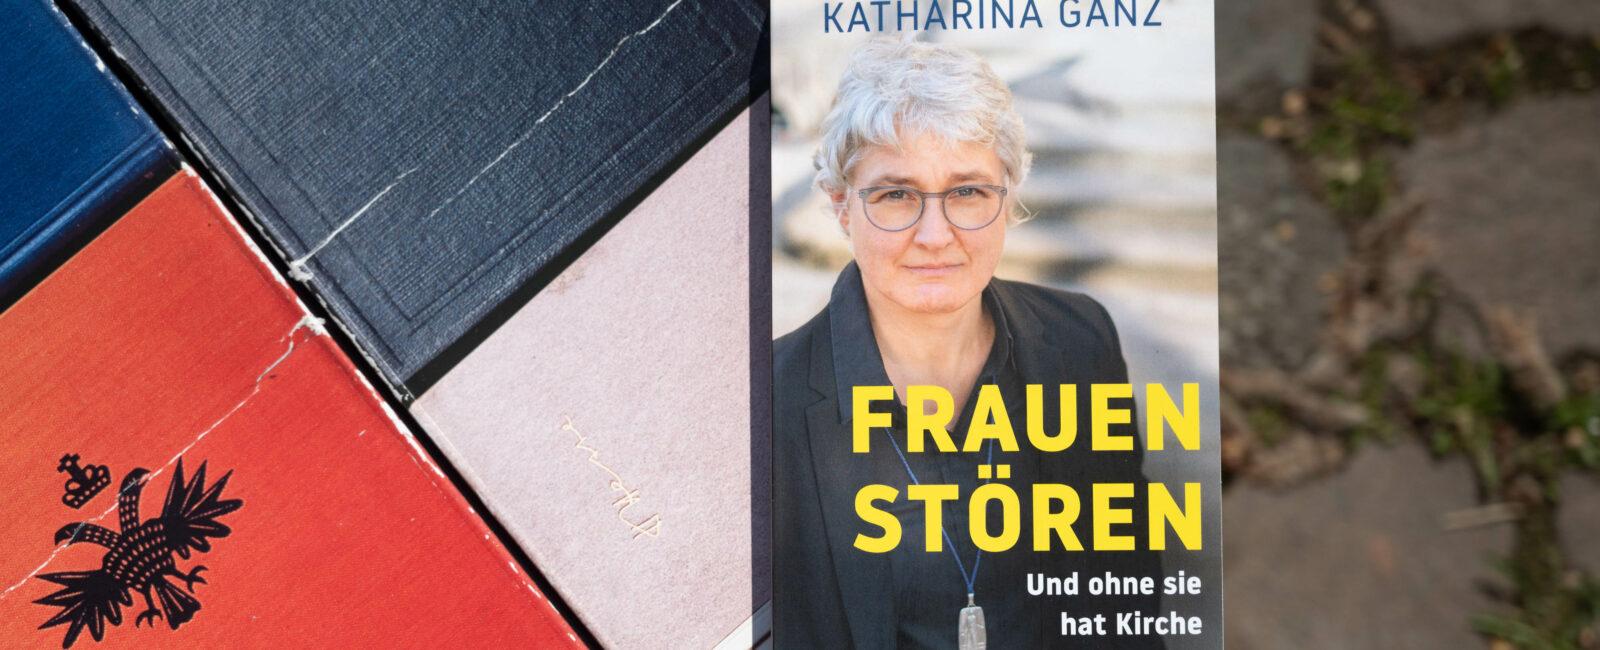 Katharina Ganz